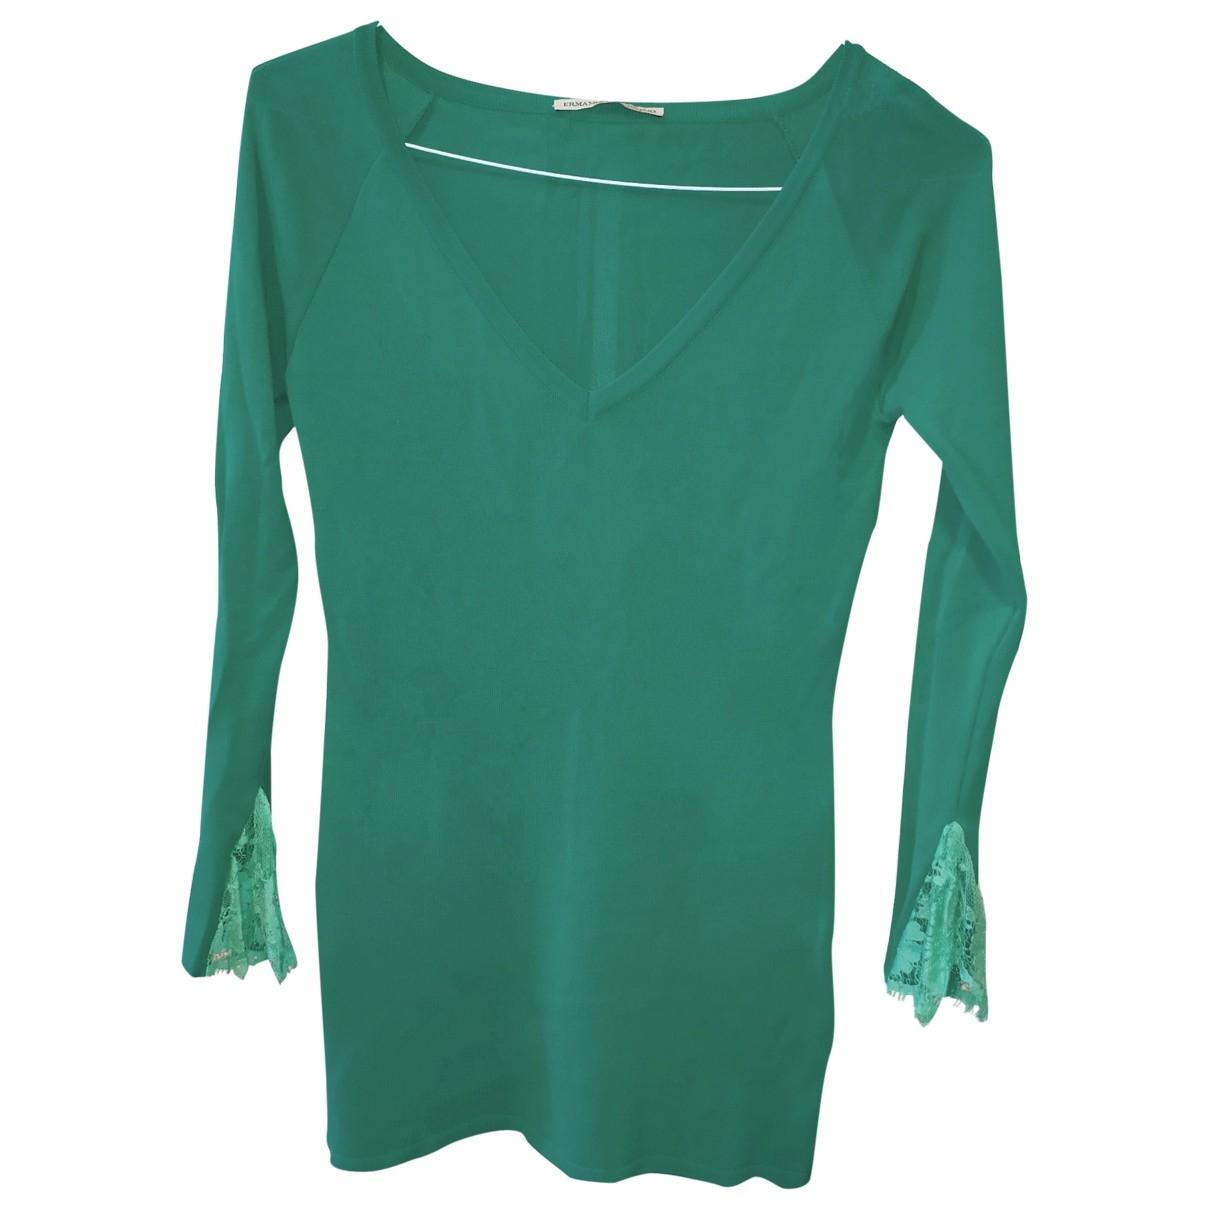 Ermanno Scervino \N Green  top for Women 40 IT